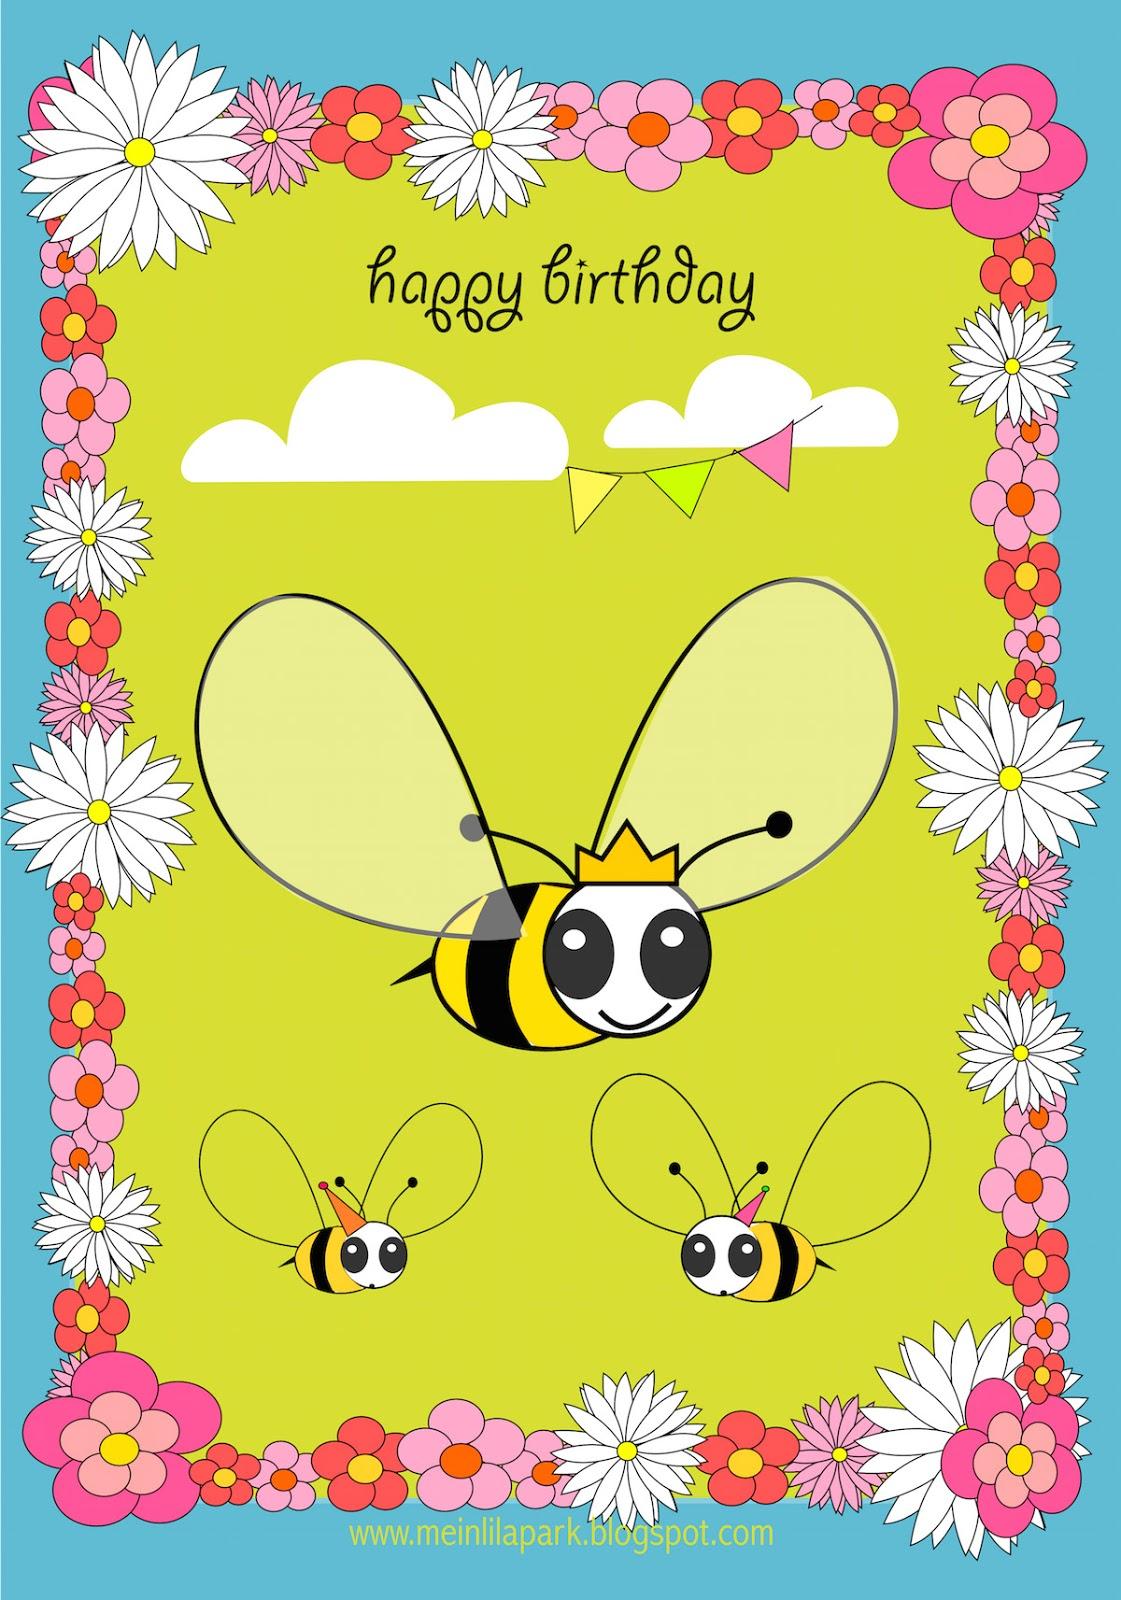 Free Printable Happy Birthday Card For Kids Ausdruckbare